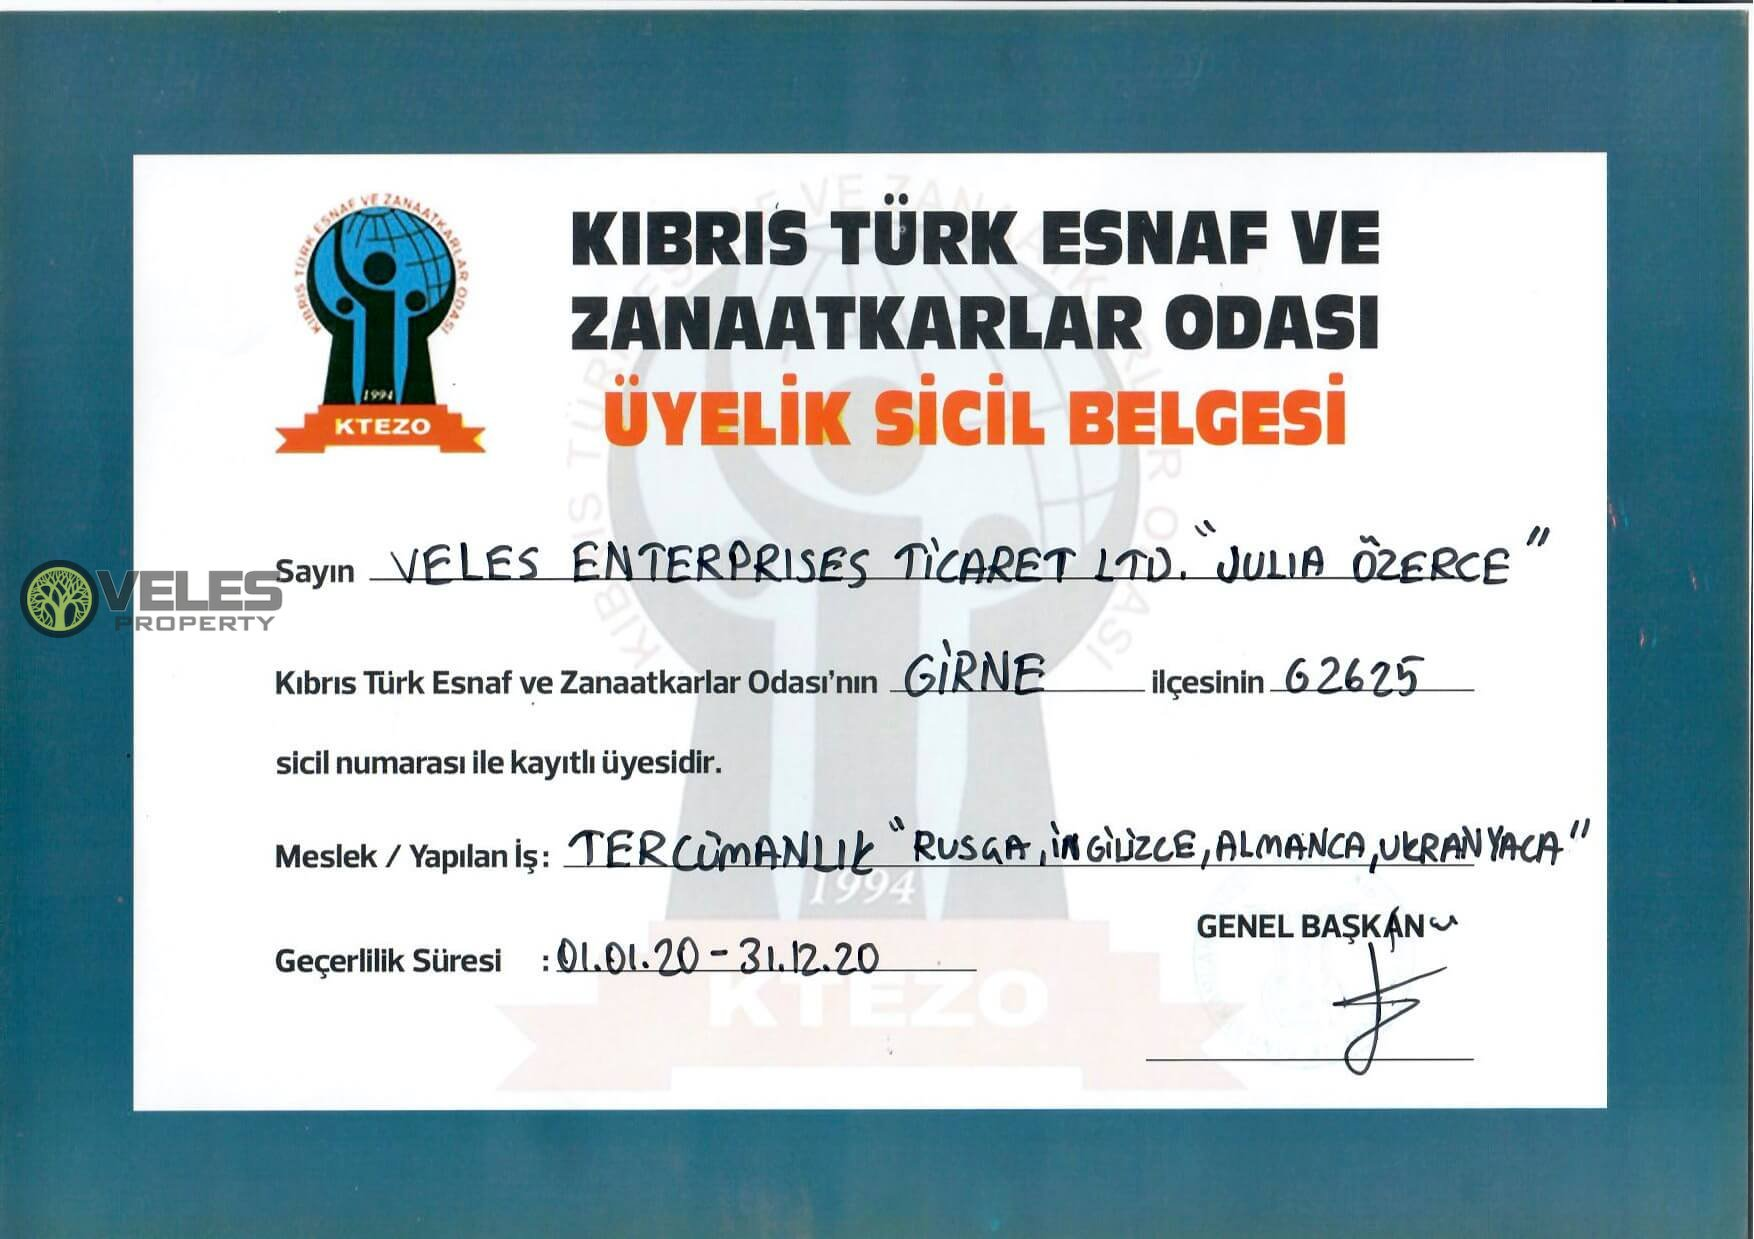 Veles Translation License